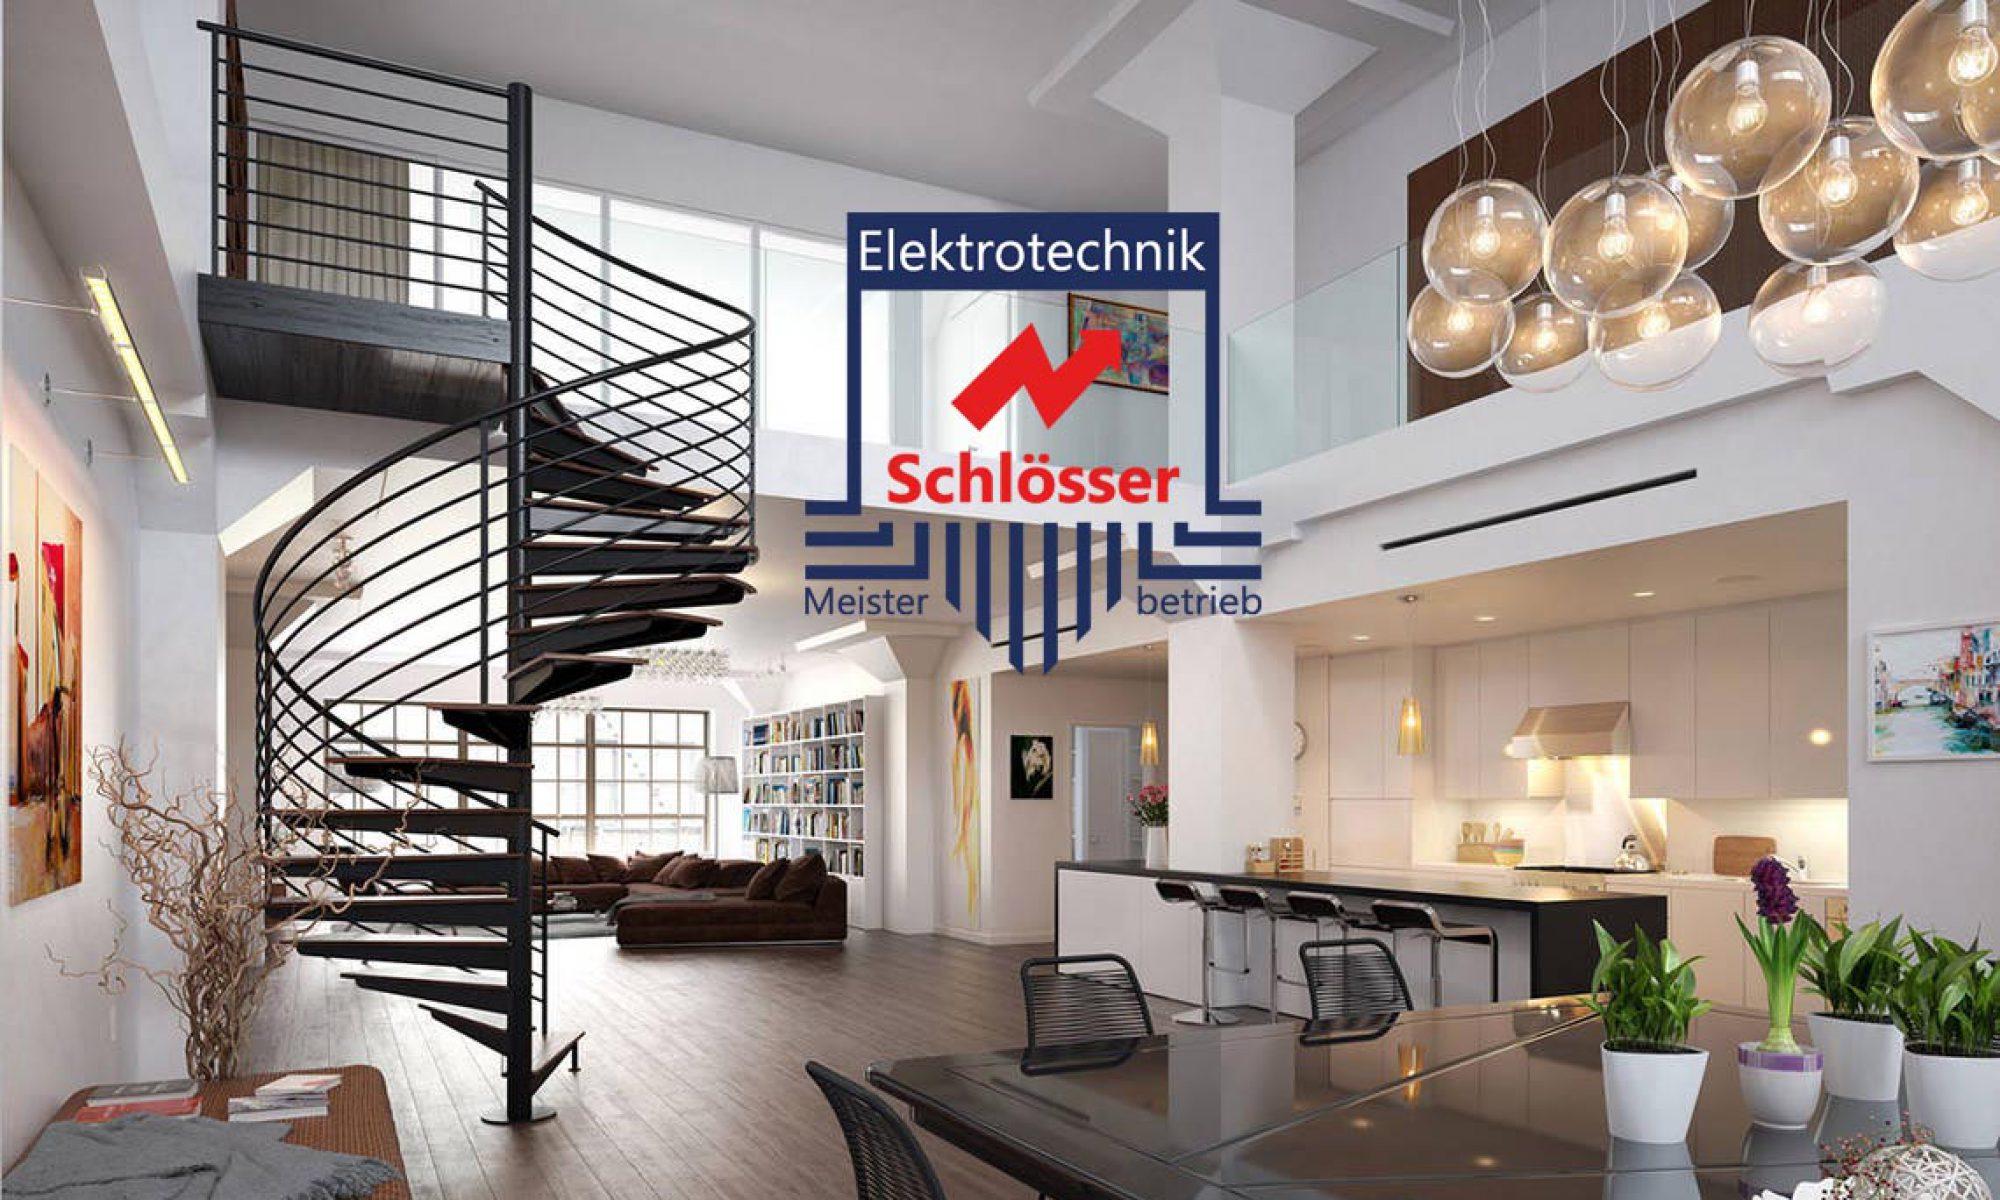 Elektrotechnik Schlösser